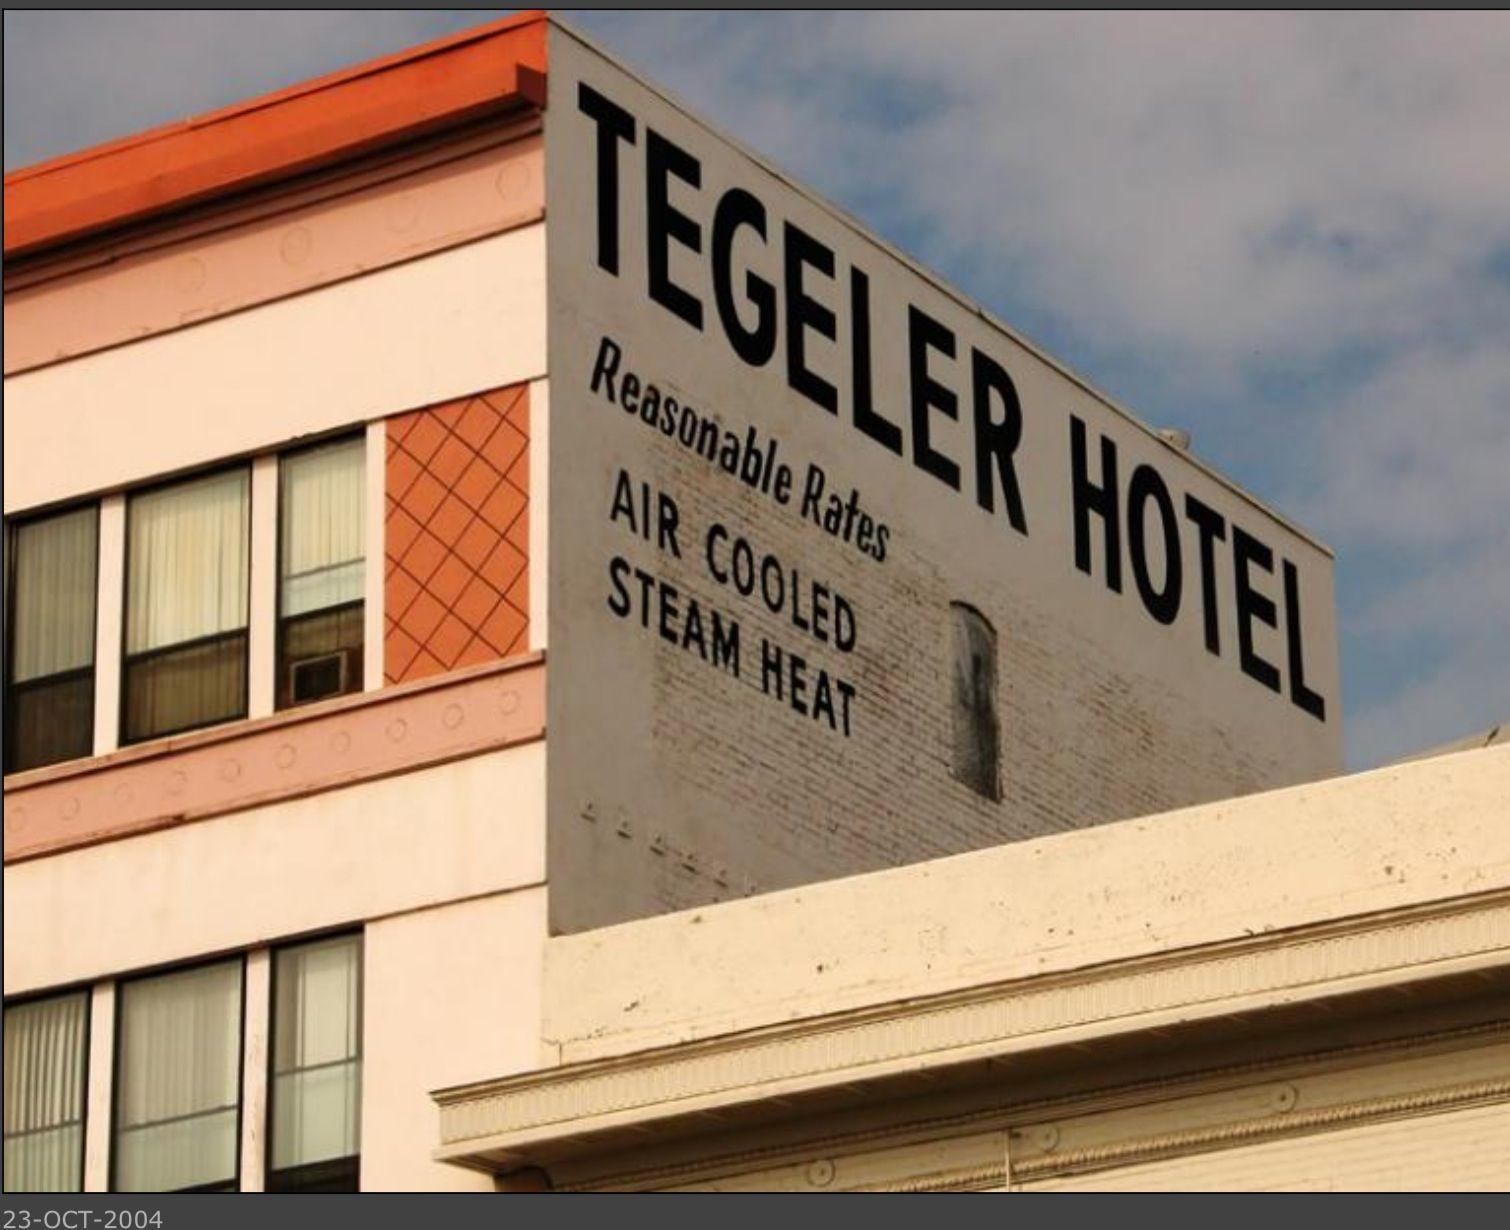 The Old Tegeler Hotel Built In 1914 At 1908 H Street Bakersfield Ca Bakersfield California Bakersfield California